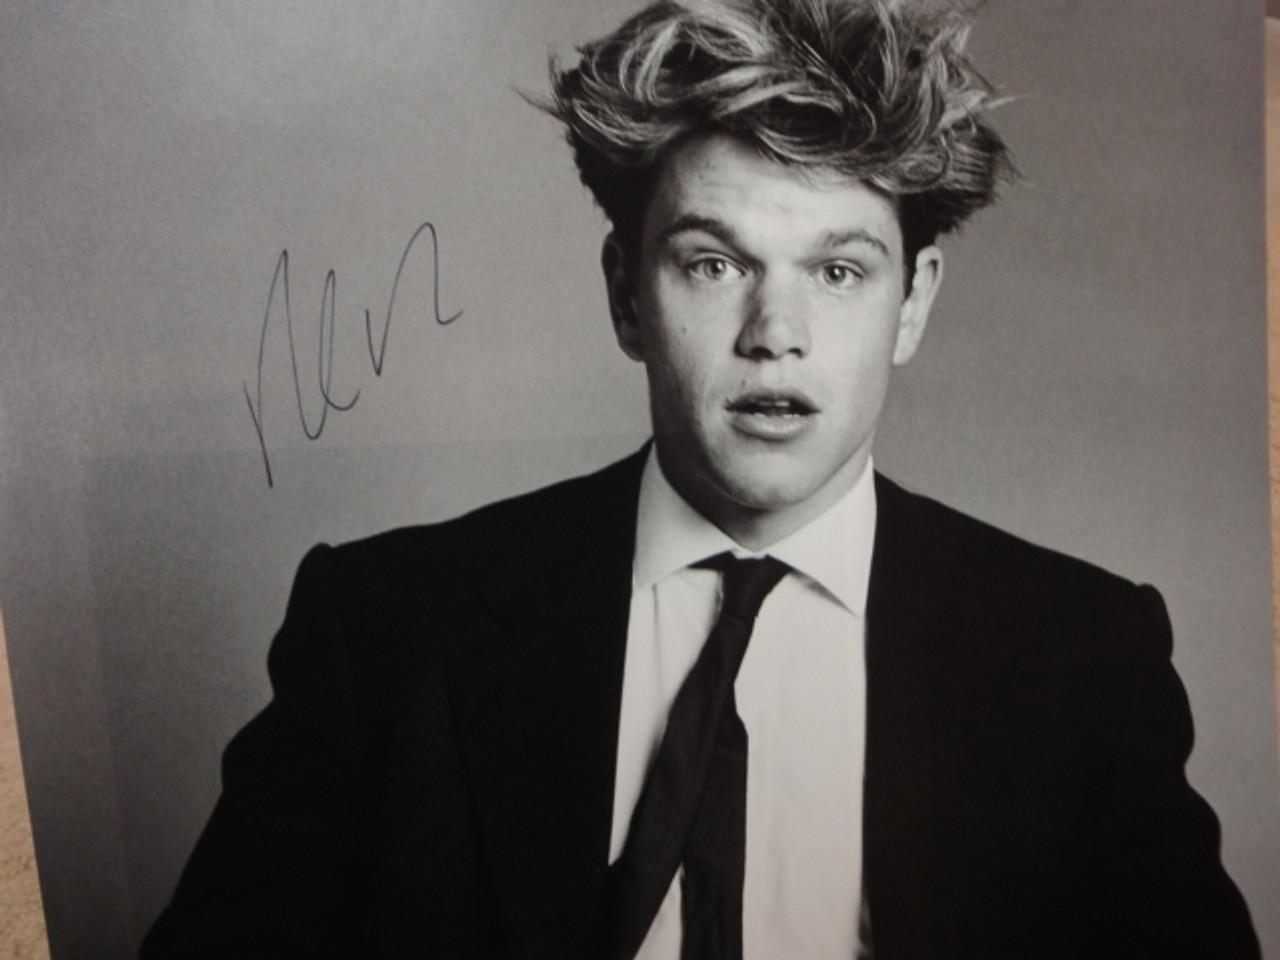 Damon, Matt Photo Signed Autograph Early